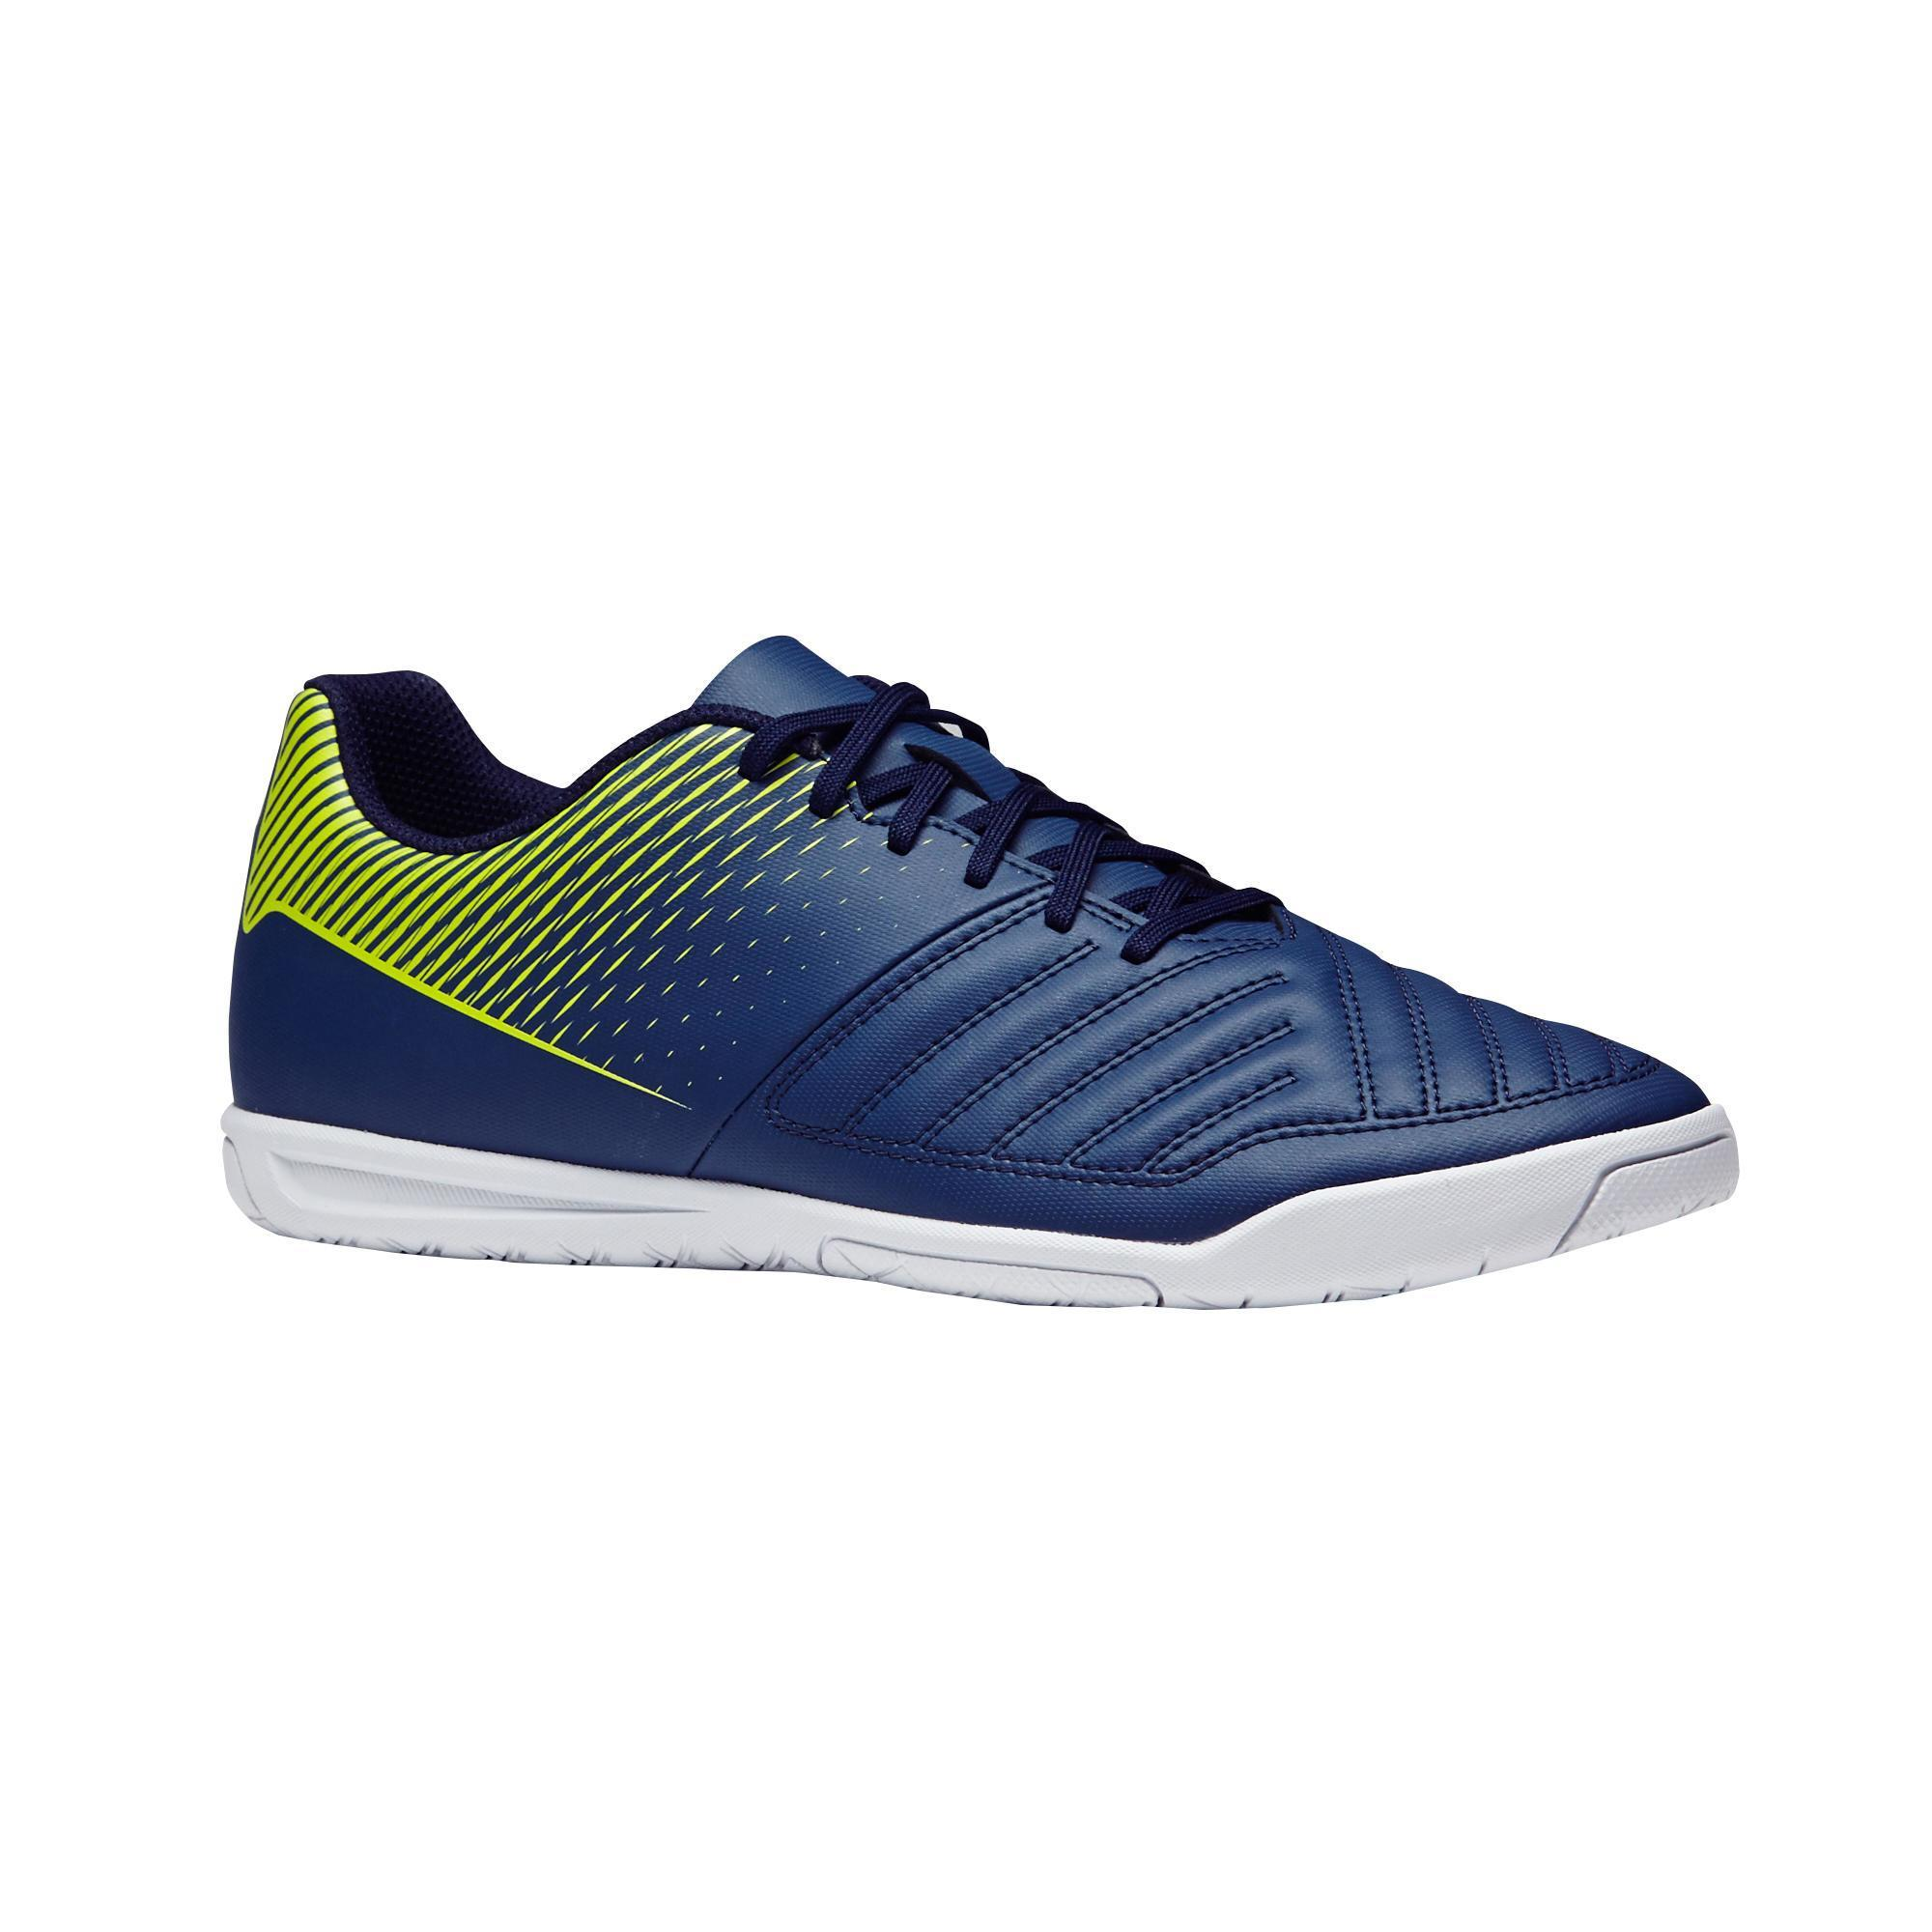 Hallenschuhe Futsal Fußball Agility 100 blau/gelb | Schuhe > Sportschuhe > Hallenschuhe | Kipsta